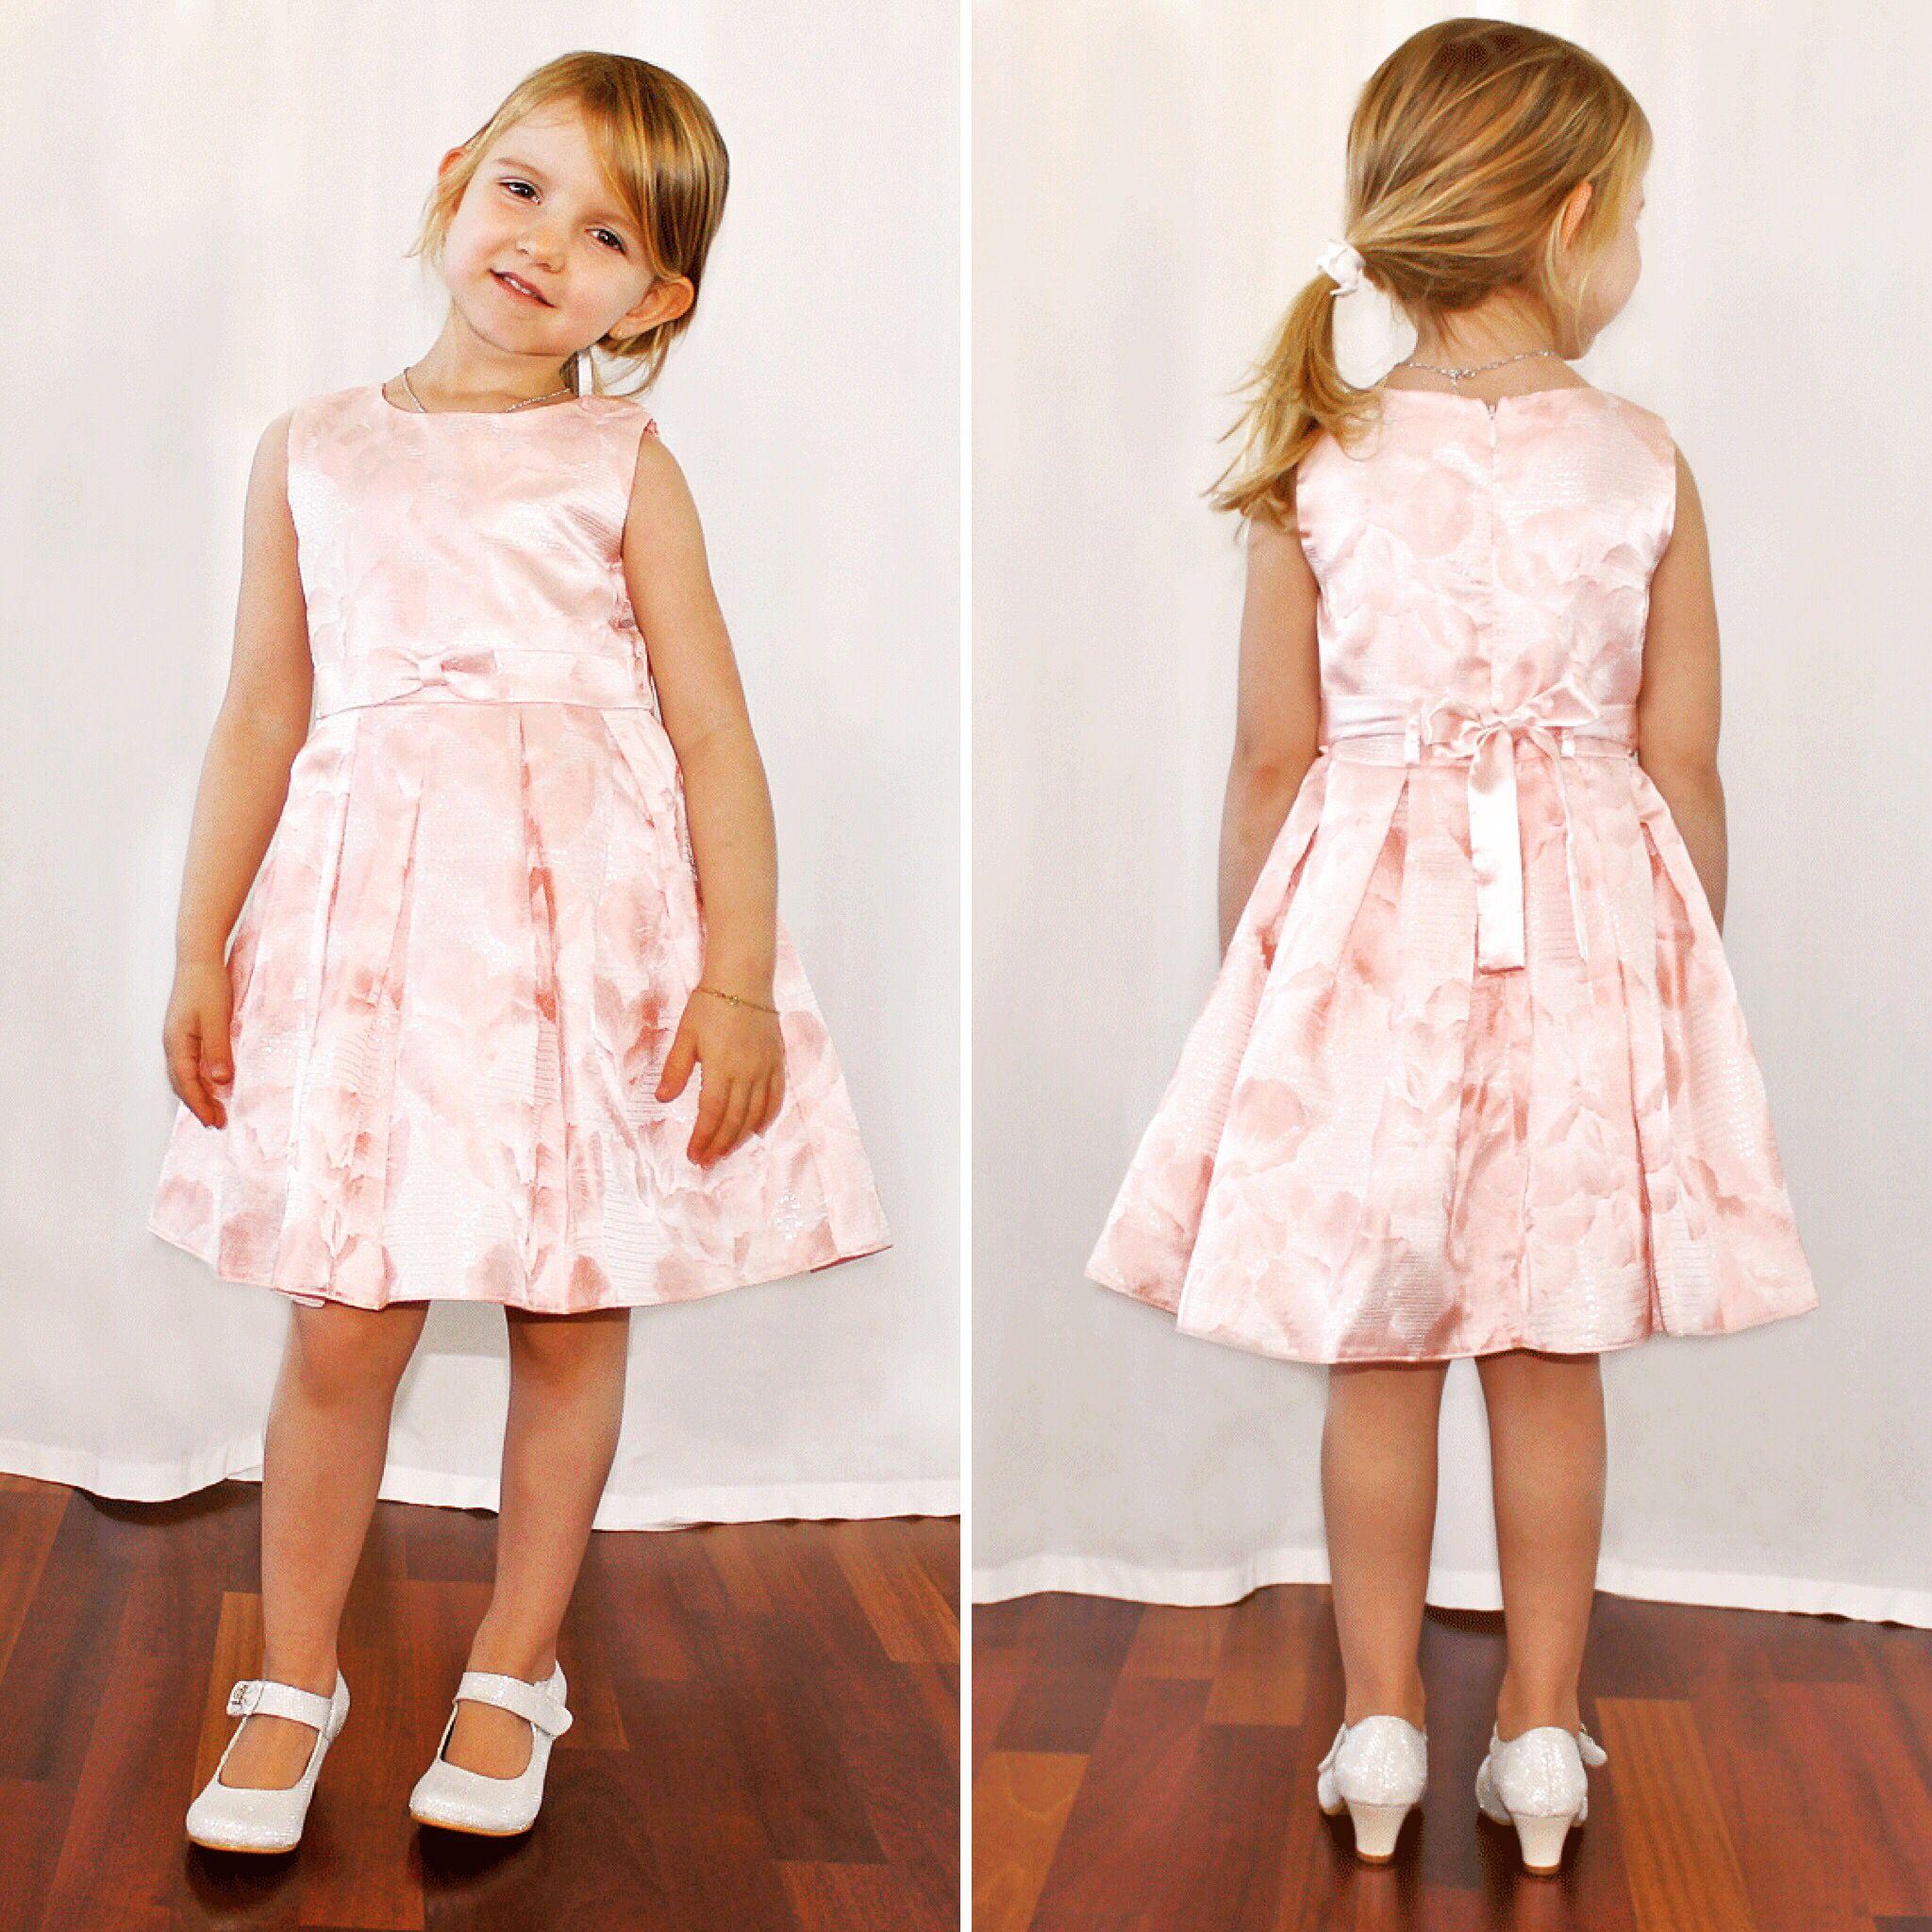 blumenmädchenkleid in rosa | blumenmädchenkleid, brautmode